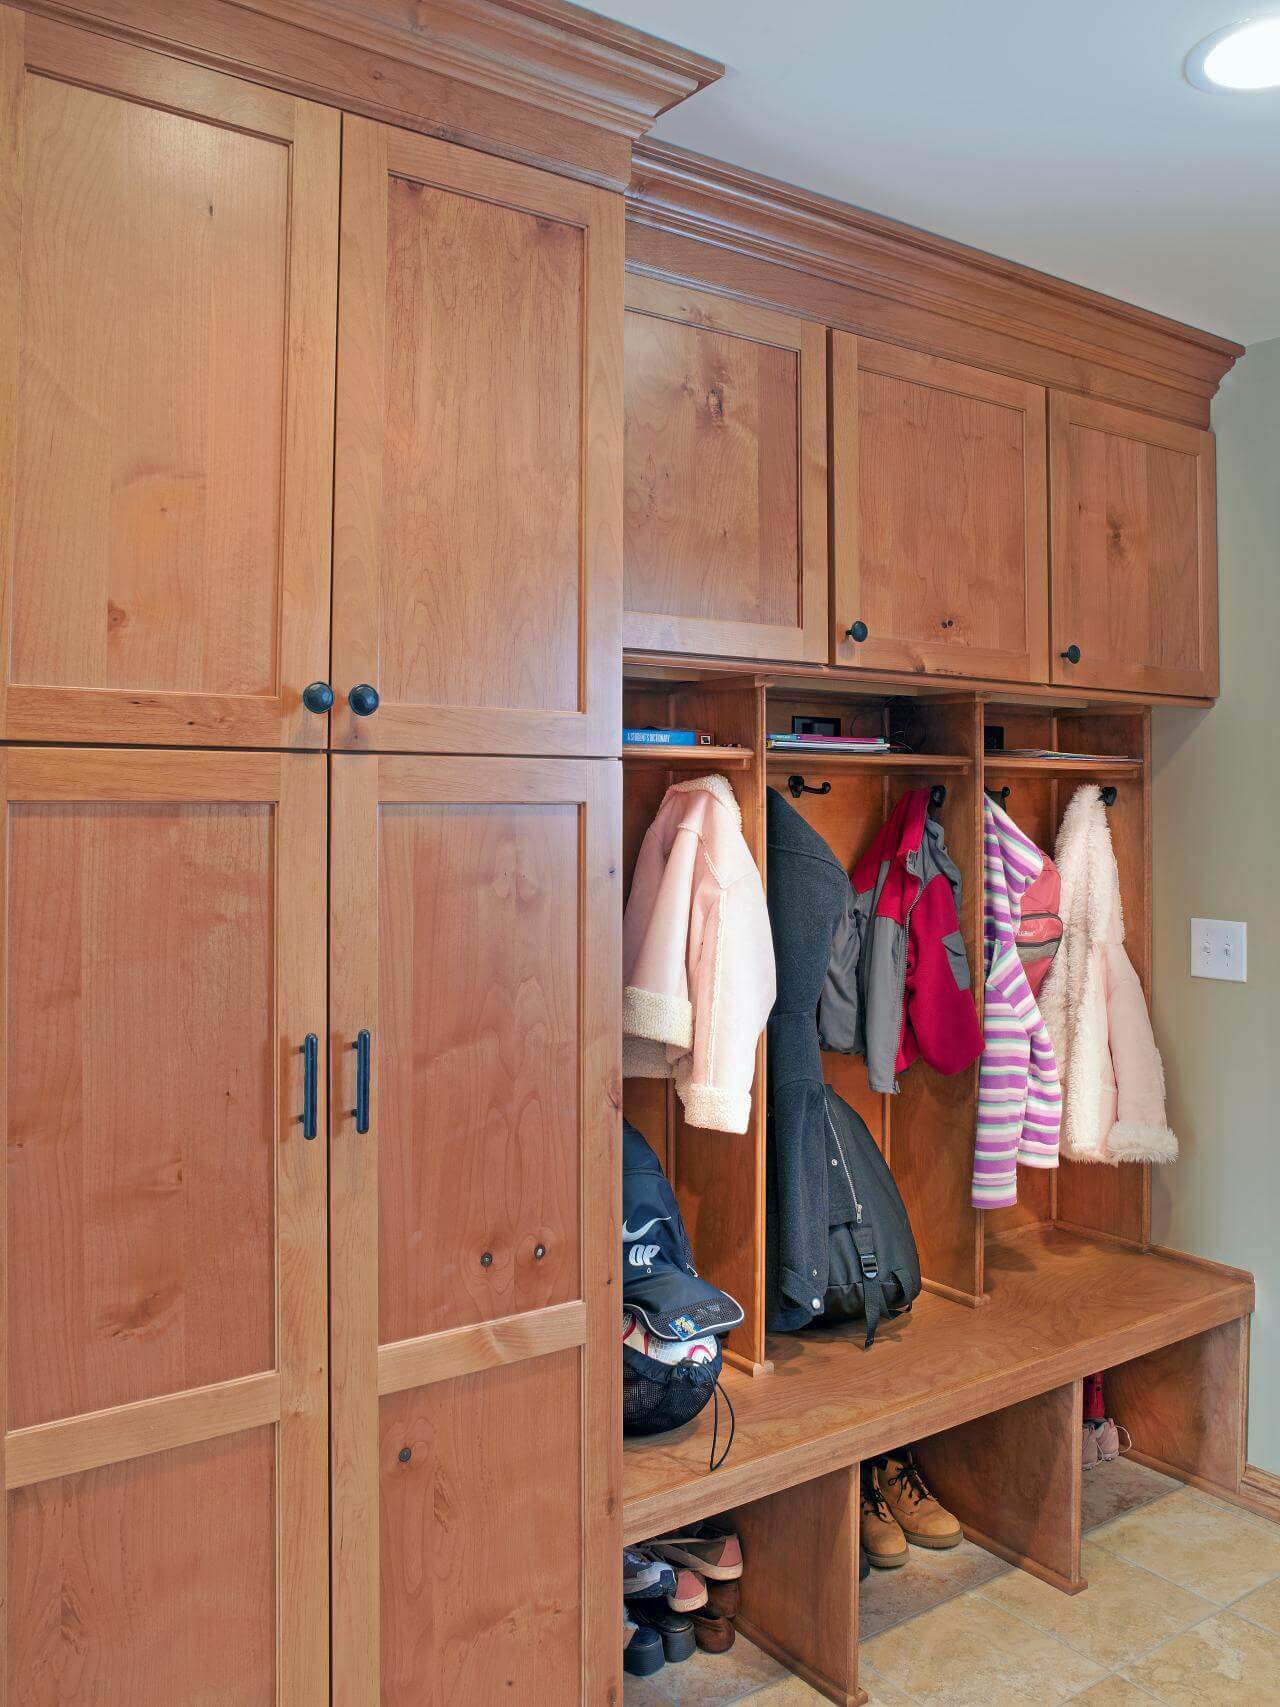 Mudroom closet organization ideas